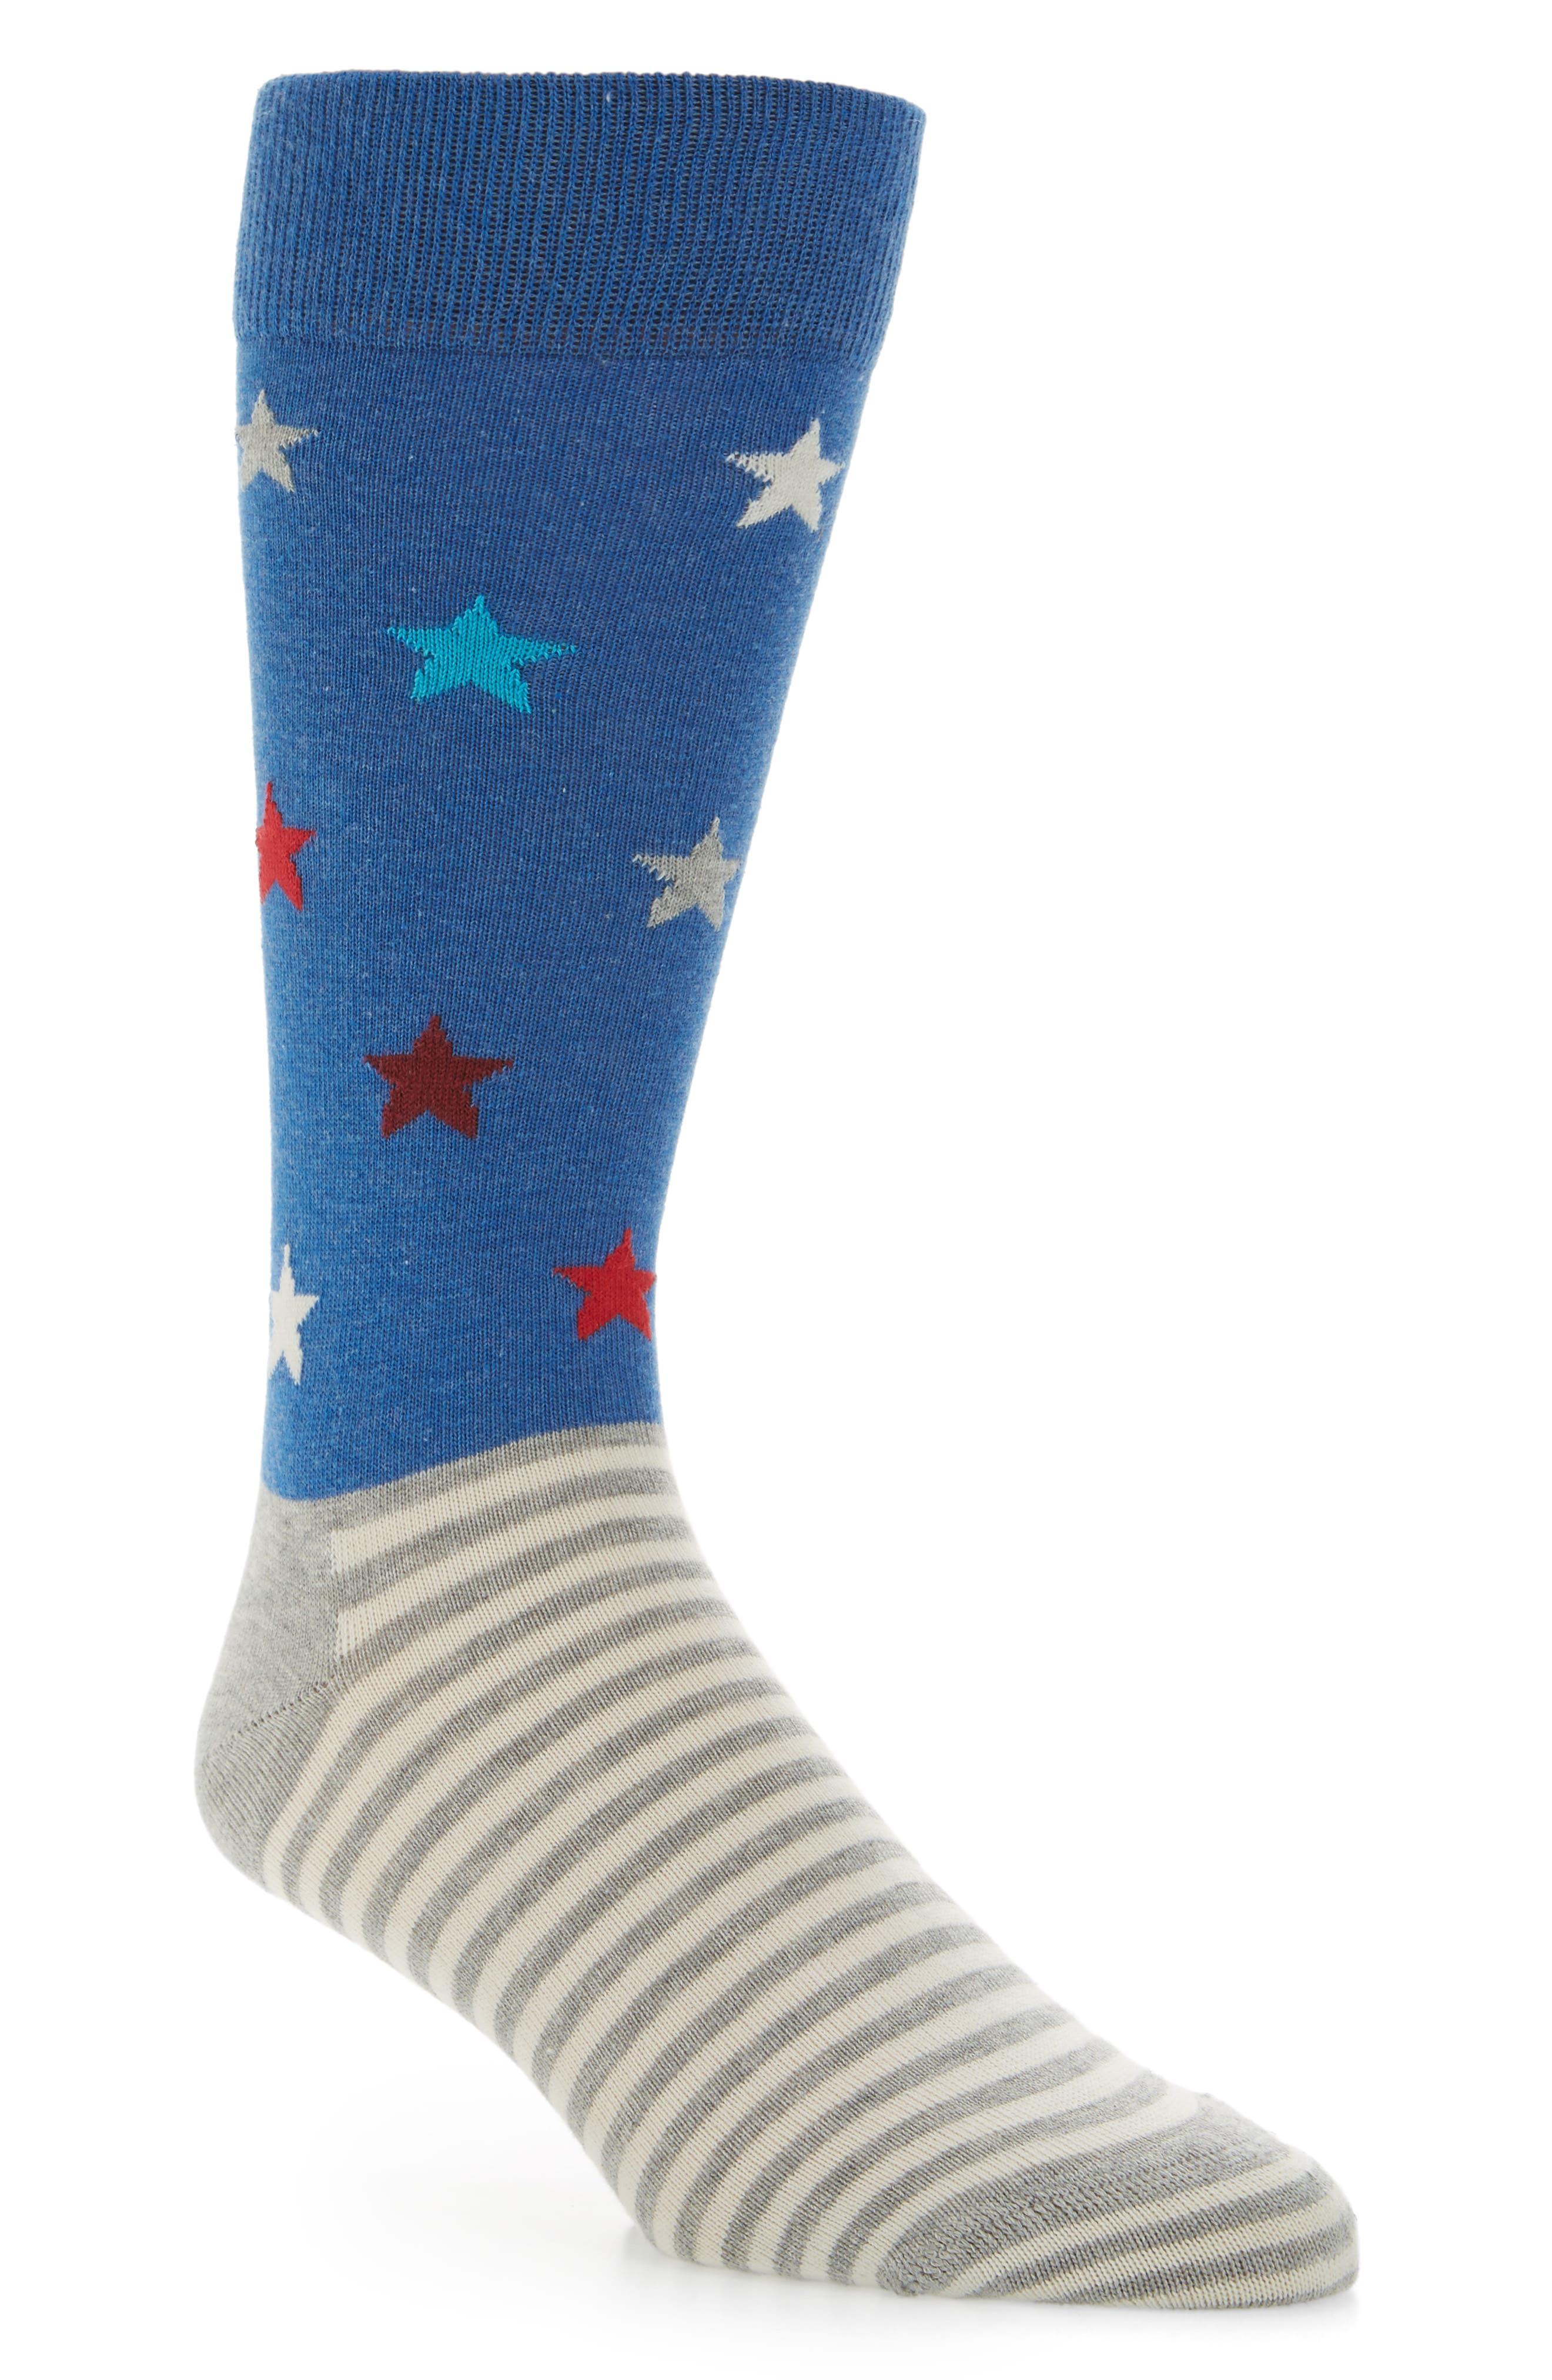 Stars & Stripes Socks,                         Main,                         color, Blue Multi